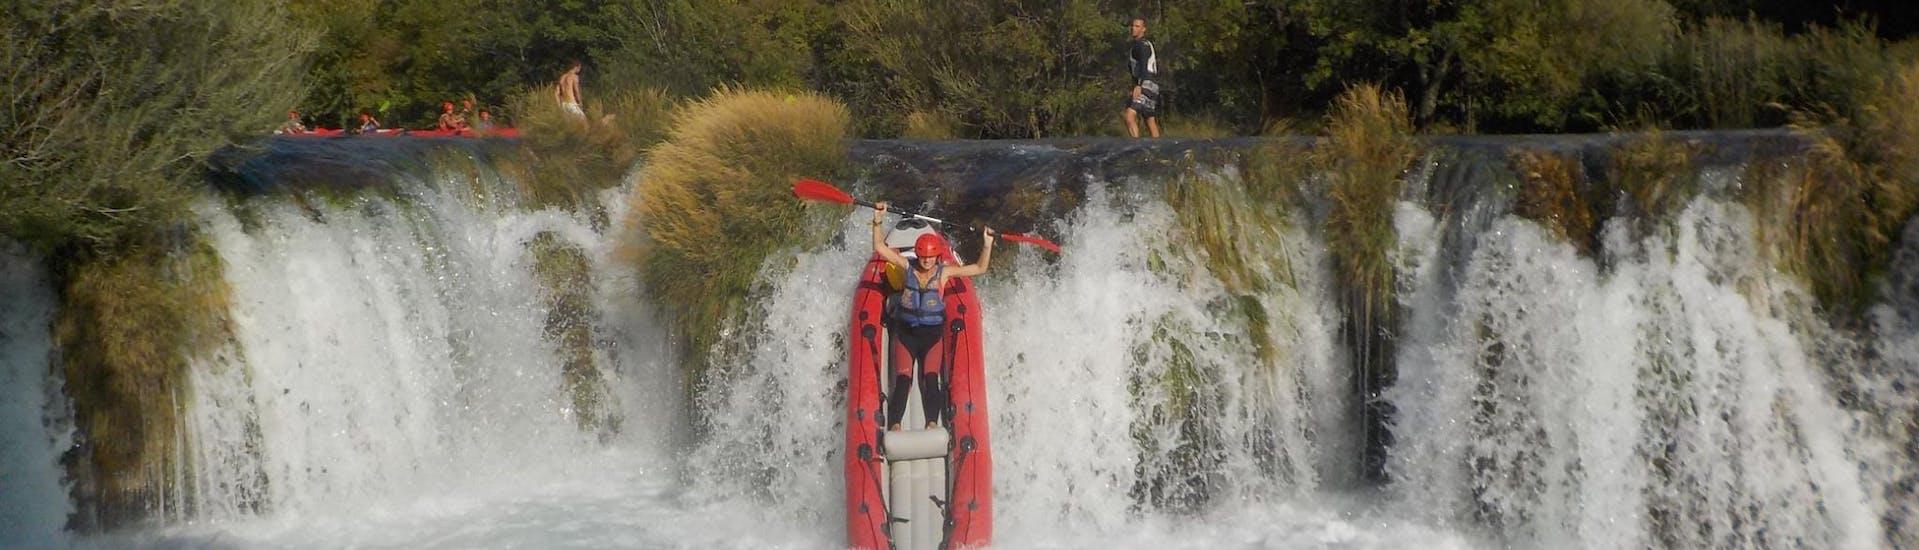 Canoeing on the Zrmanja River  with Zrmanja River Tours - Hero image